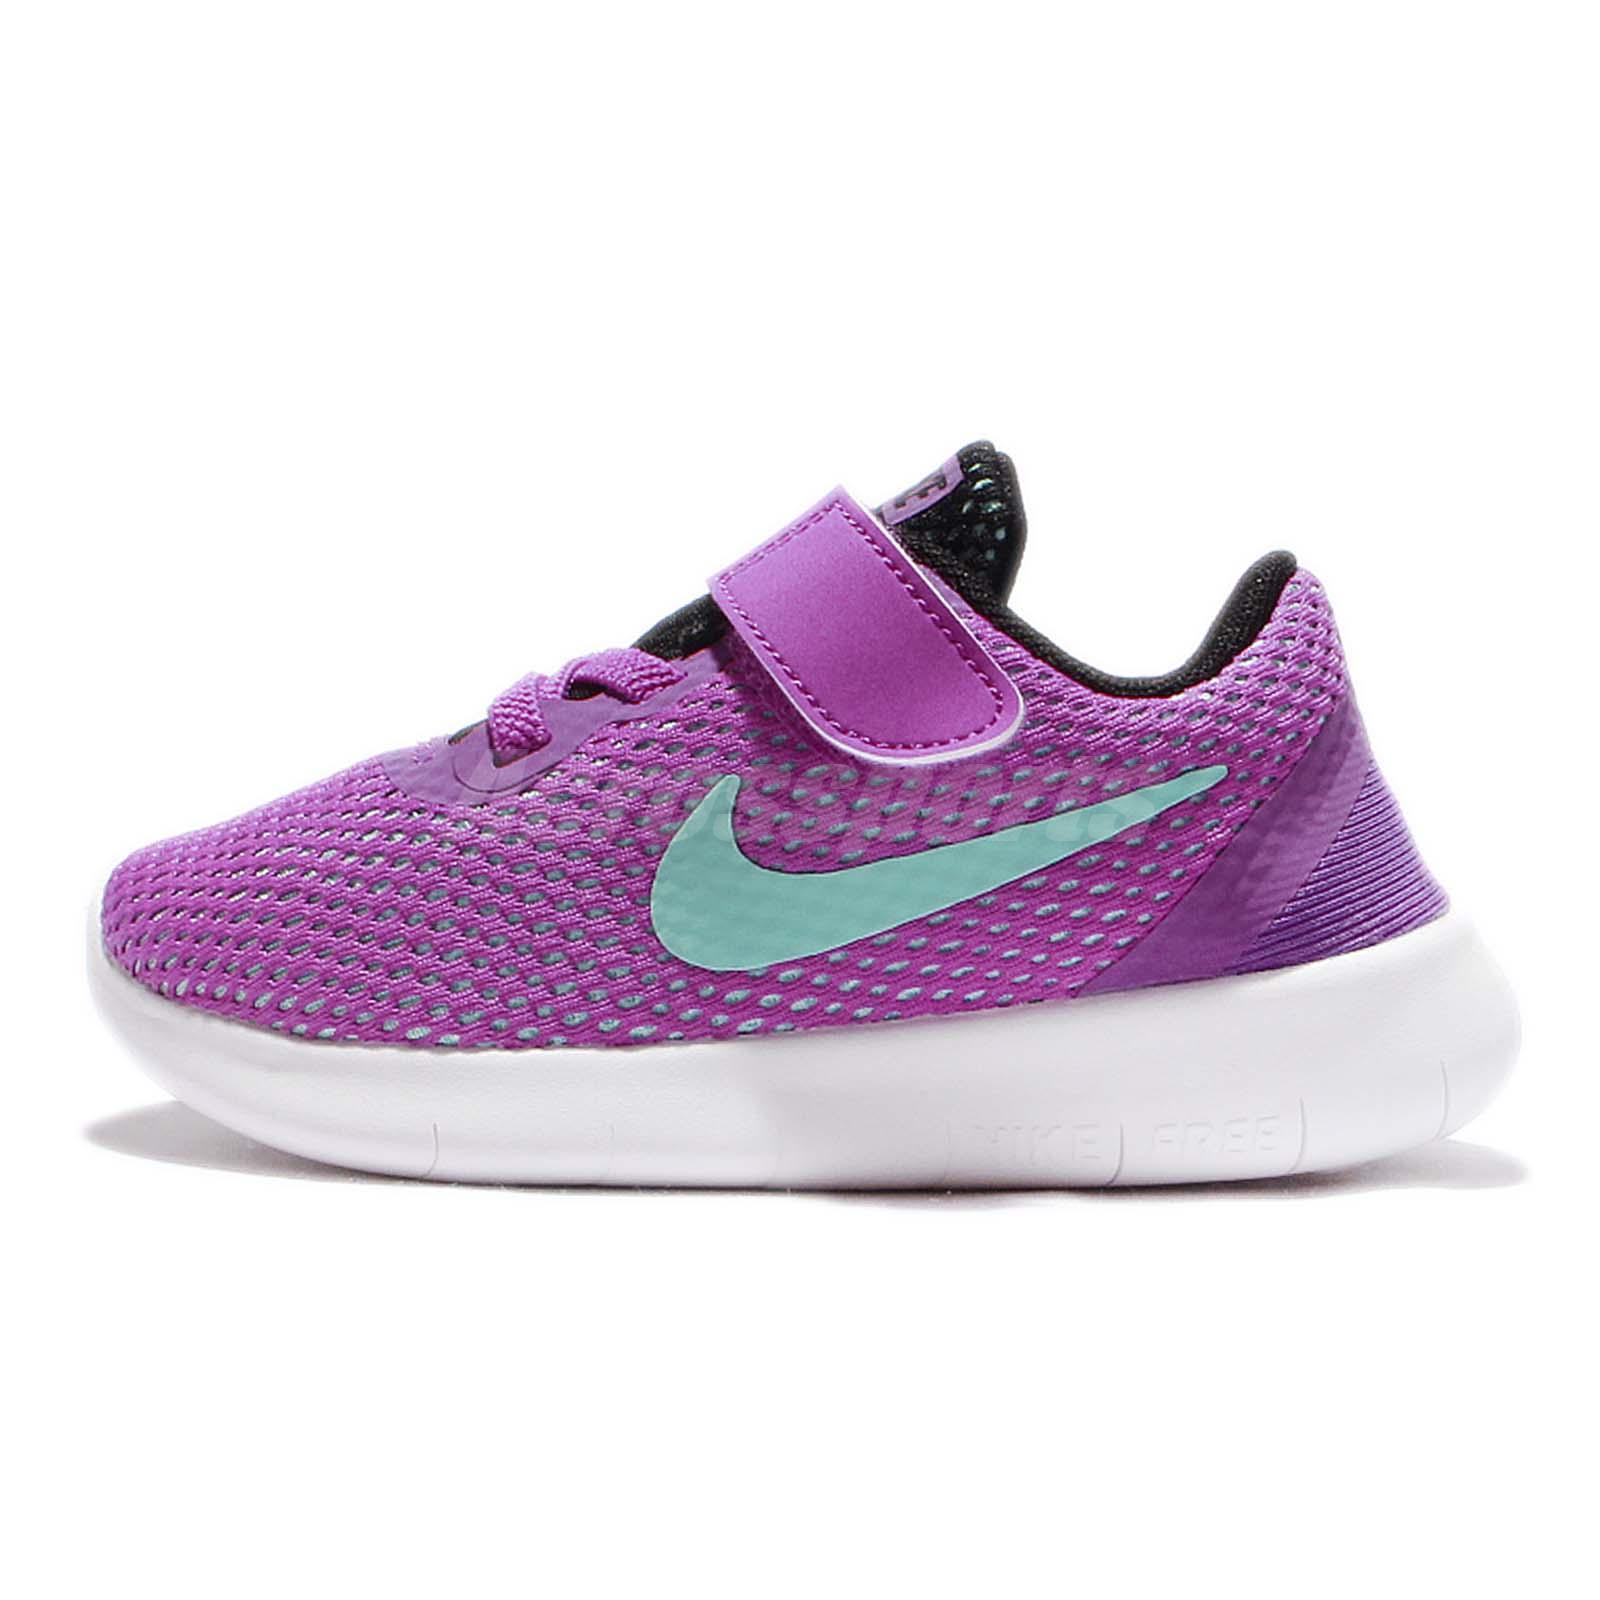 Nike Free RN TDV Run Purple Blue Toddler Infant Baby